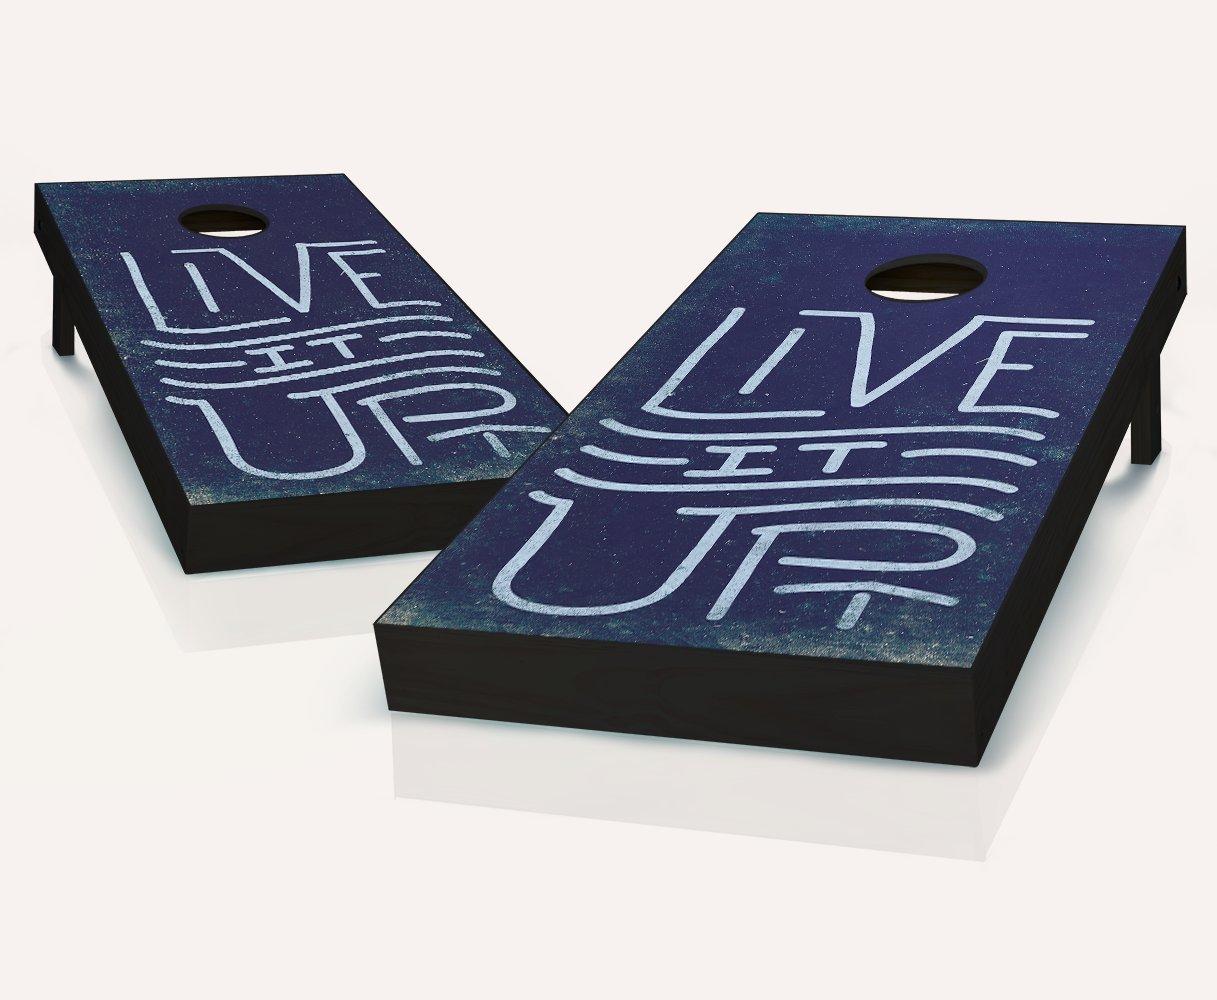 Live It Up Cornhole Boards It withのセット8 Boards Cornhole Bags withのセット8 B07BWVKCCS, BILLABONG ONLINE STORE:40809d71 --- webshop.mrf.se